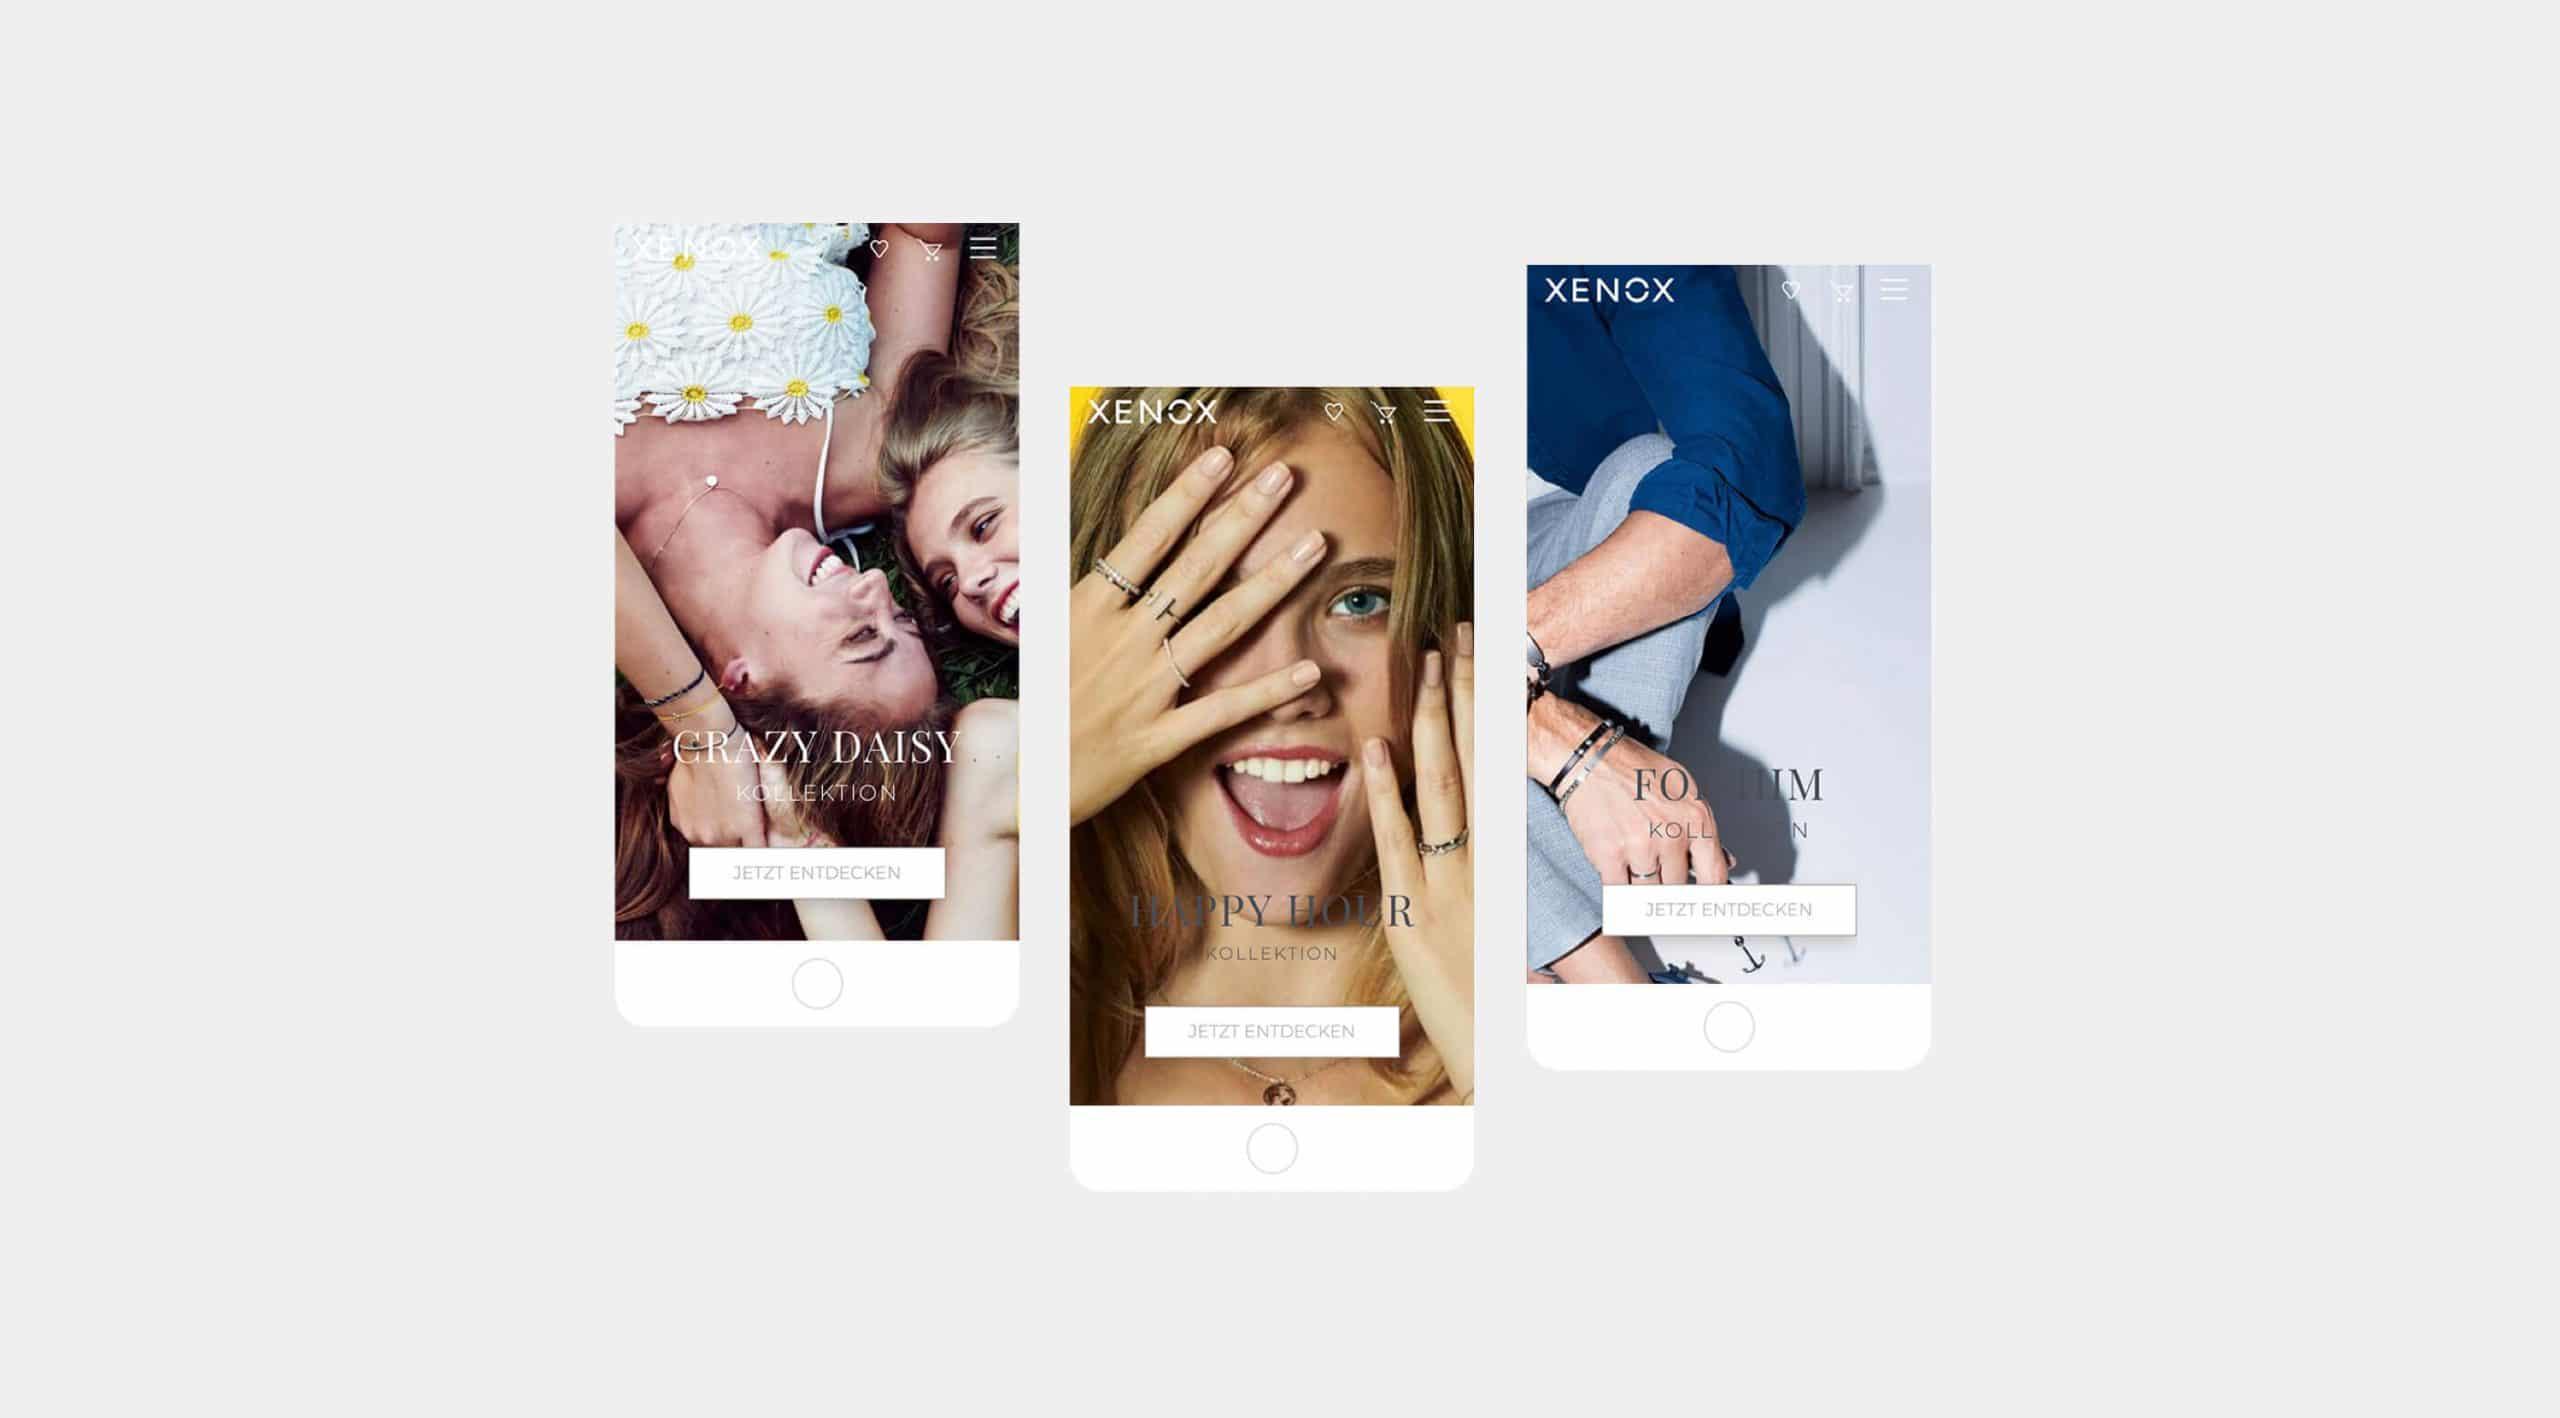 Website Onlineshop Digitale Projekte Branding Mobile